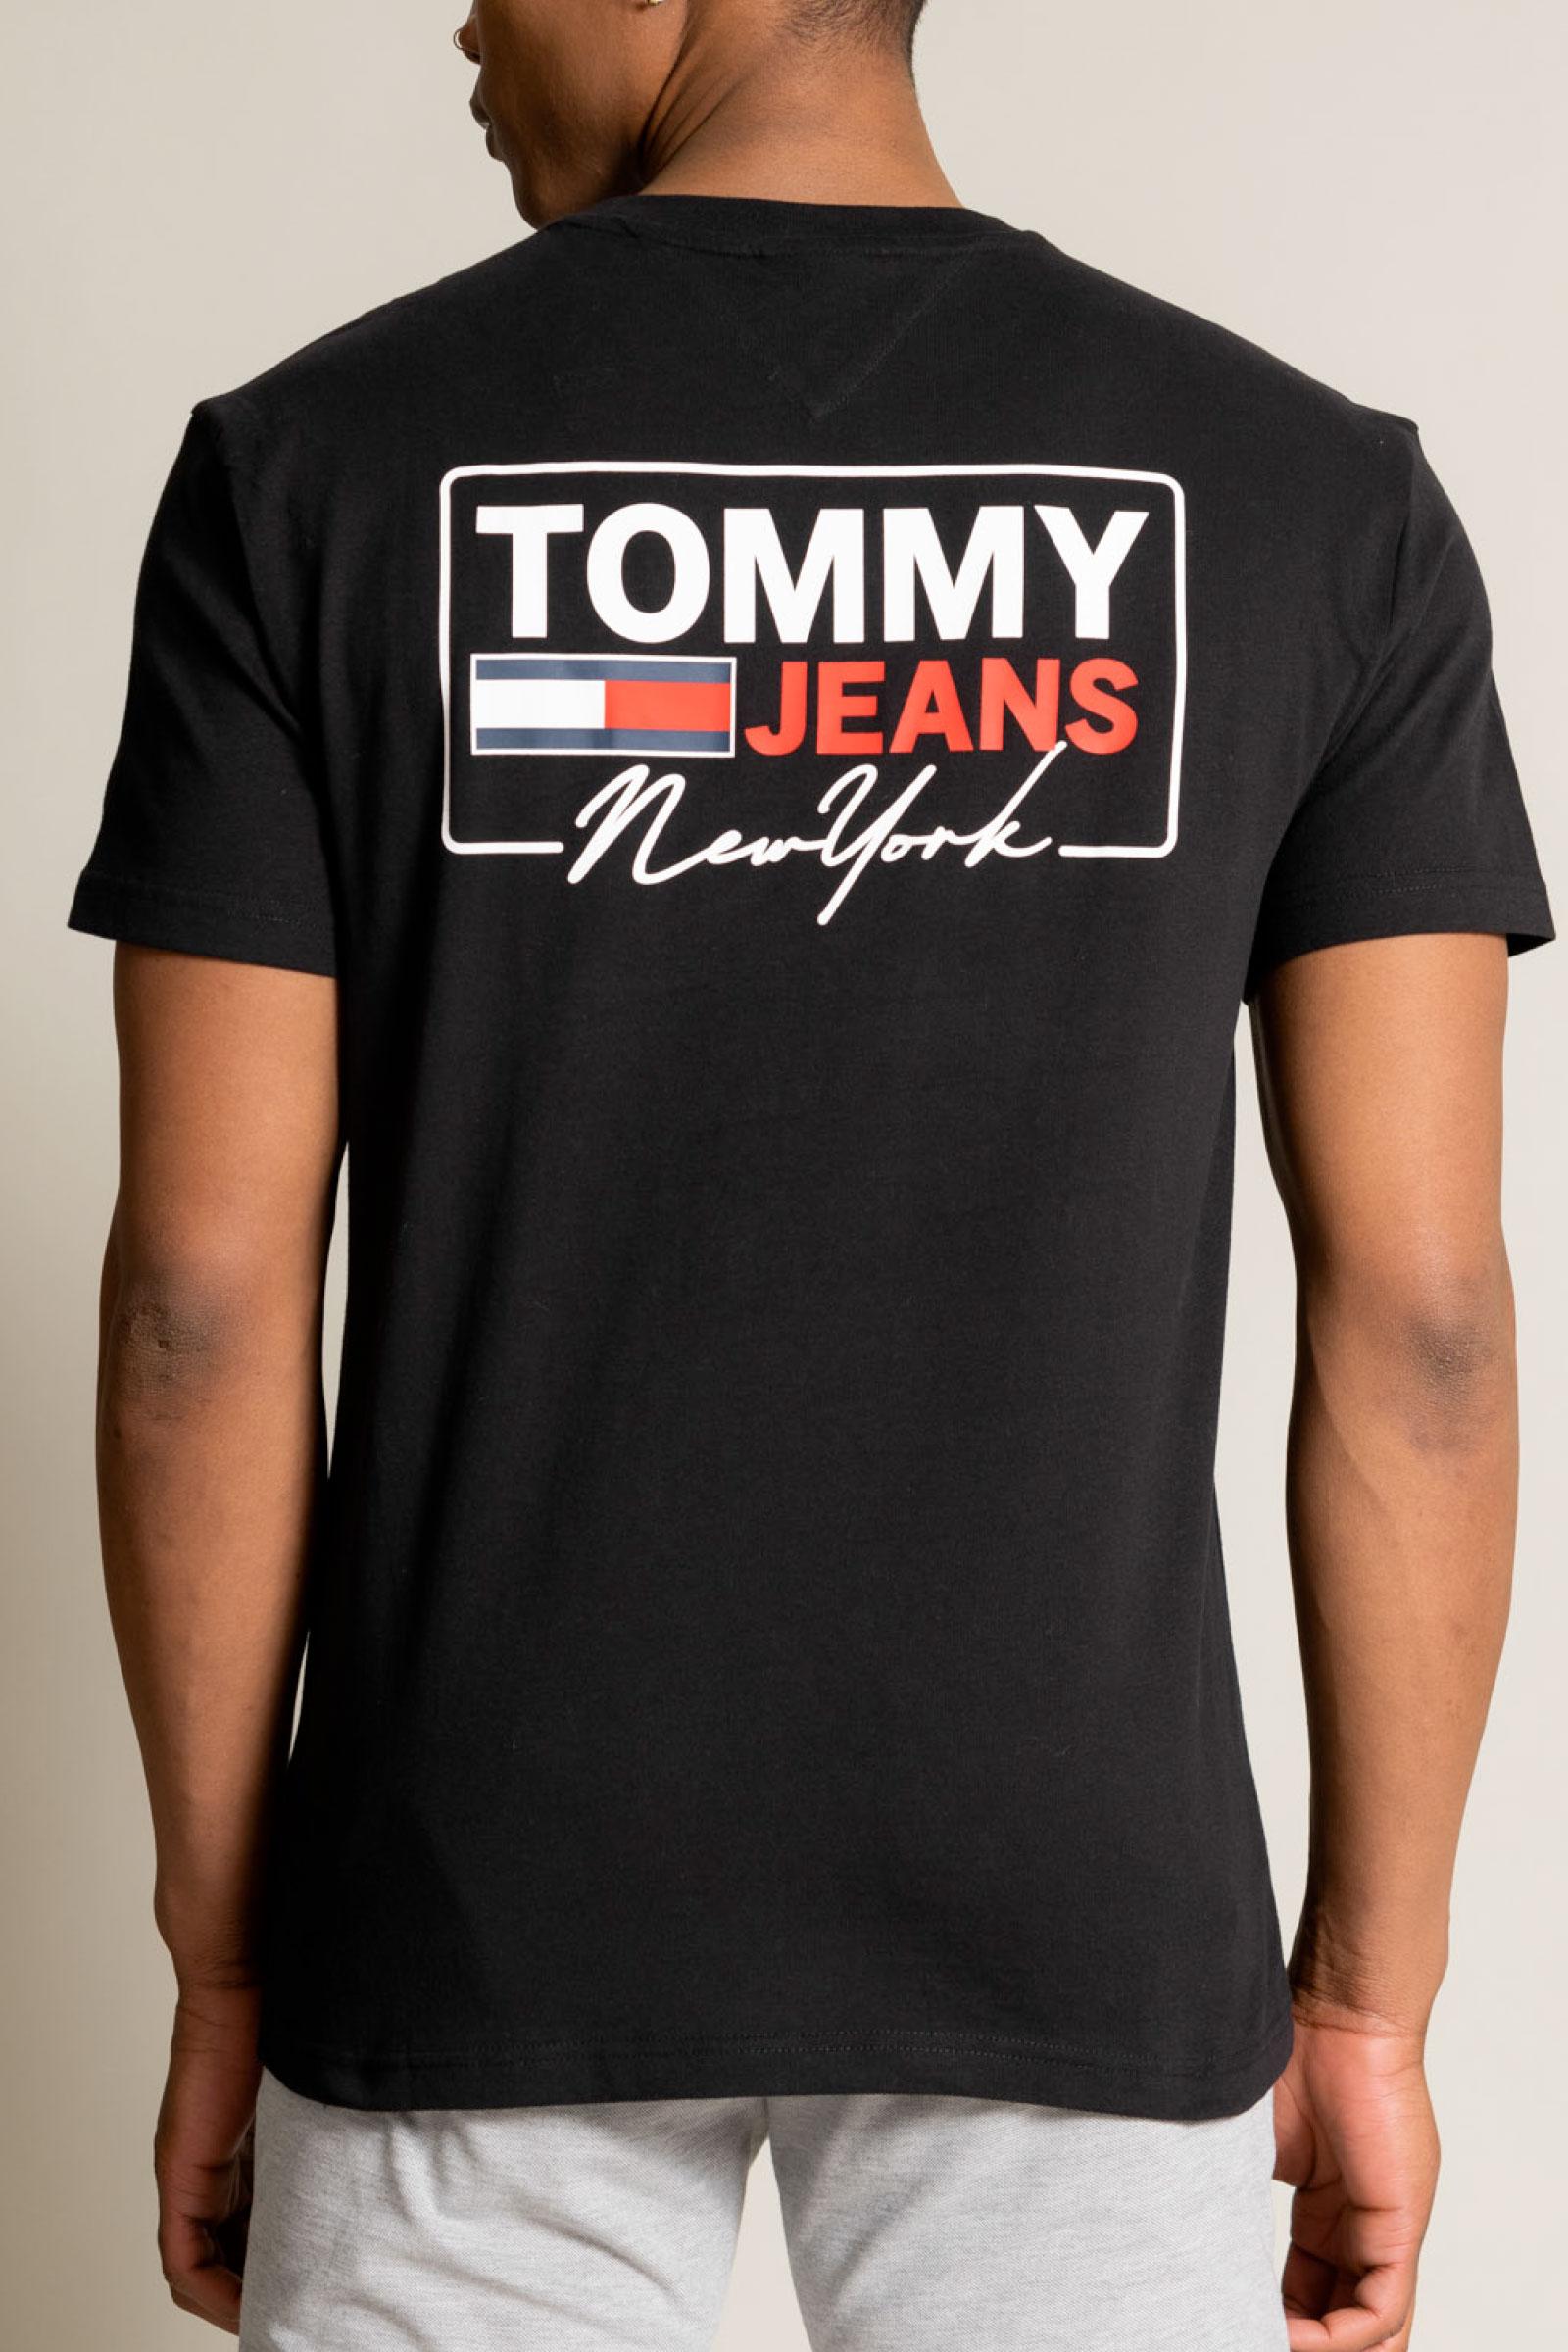 TOMMY JEANS T-Shirt Uomo TOMMY JEANS | T-Shirt | DM0DM10216BDS